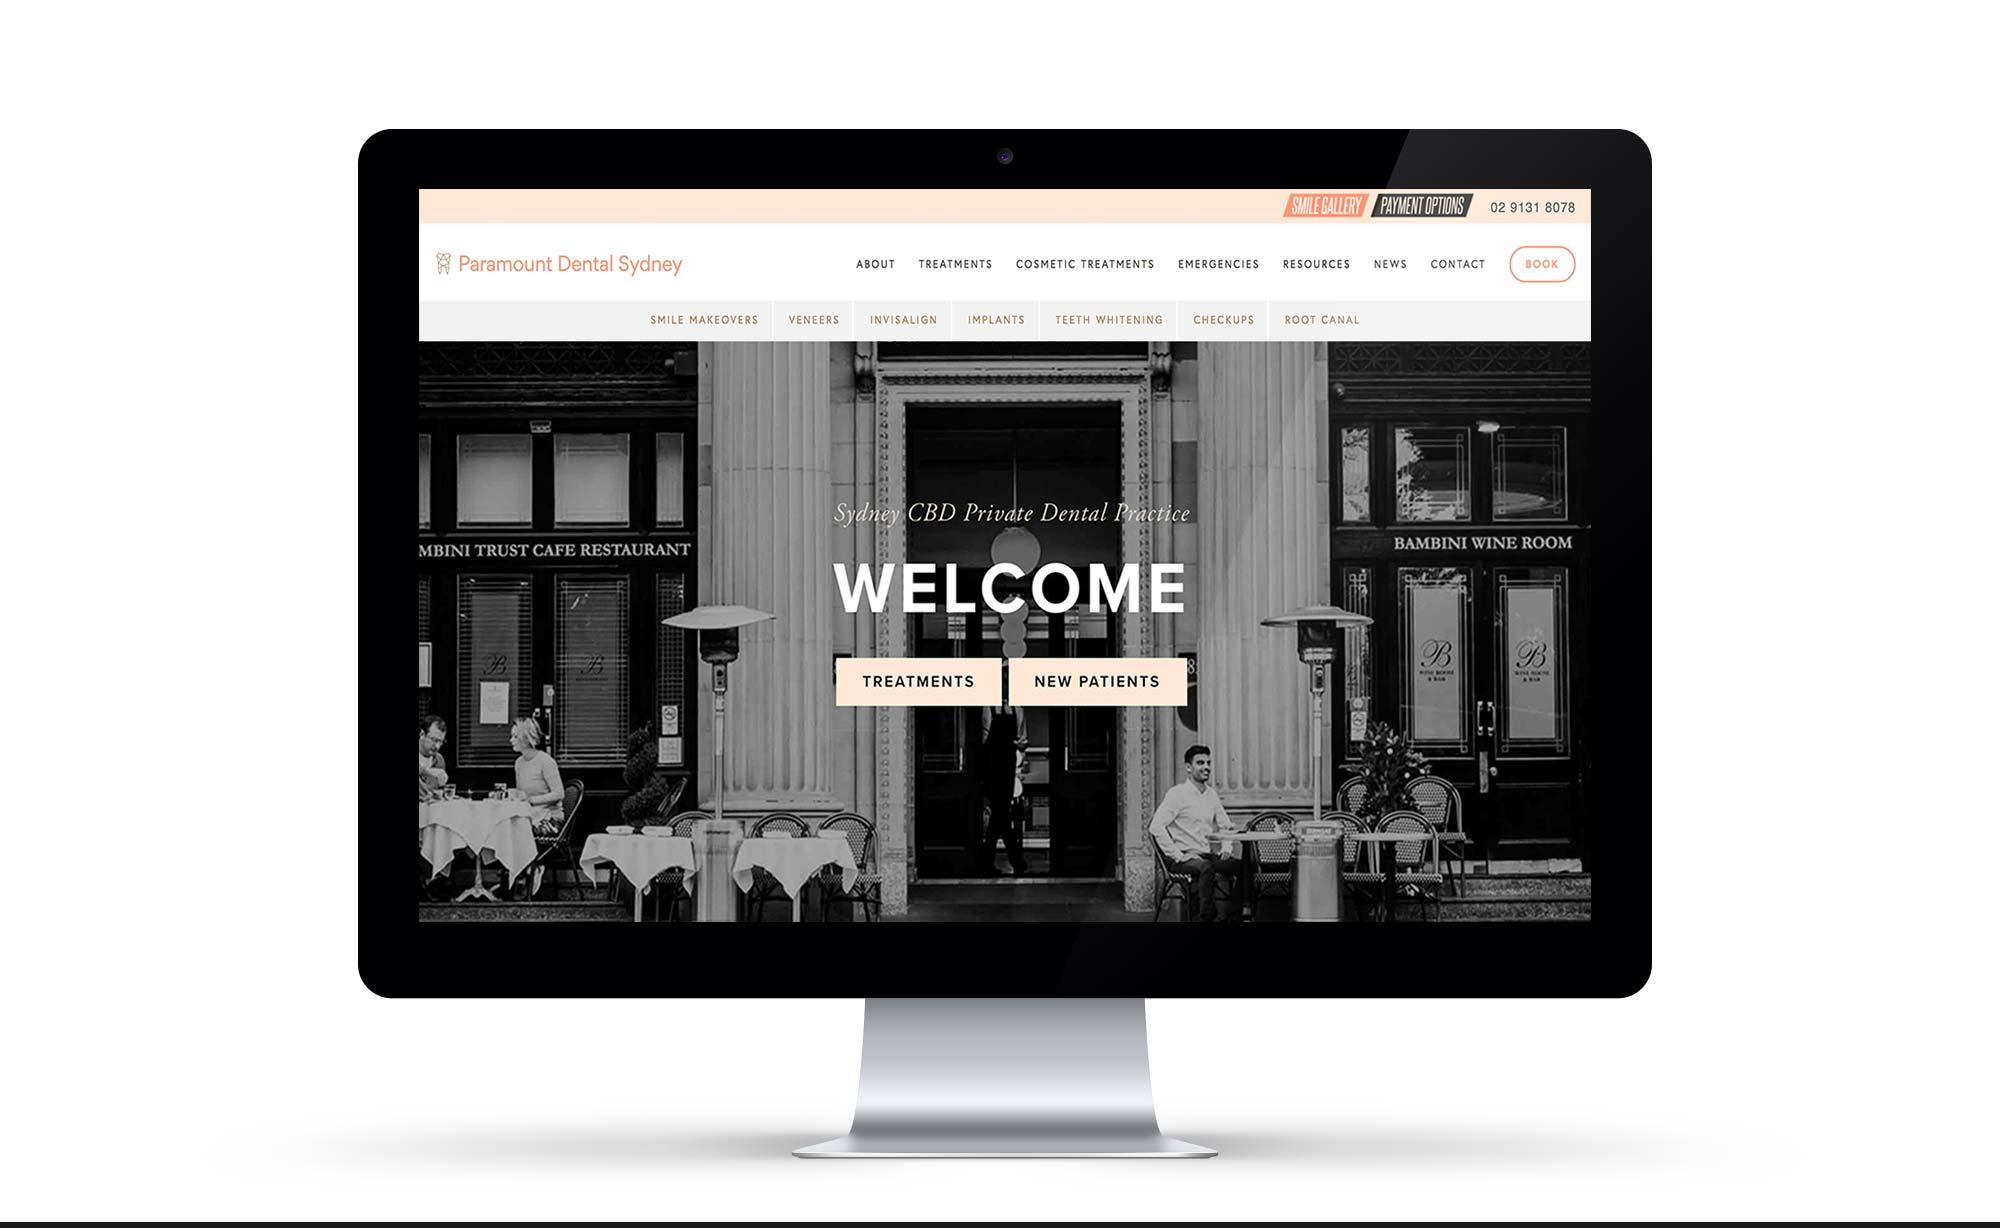 ©-Chris-Rae-Design-Paramount-Dental-Sydney-Website-Design-01.jpg